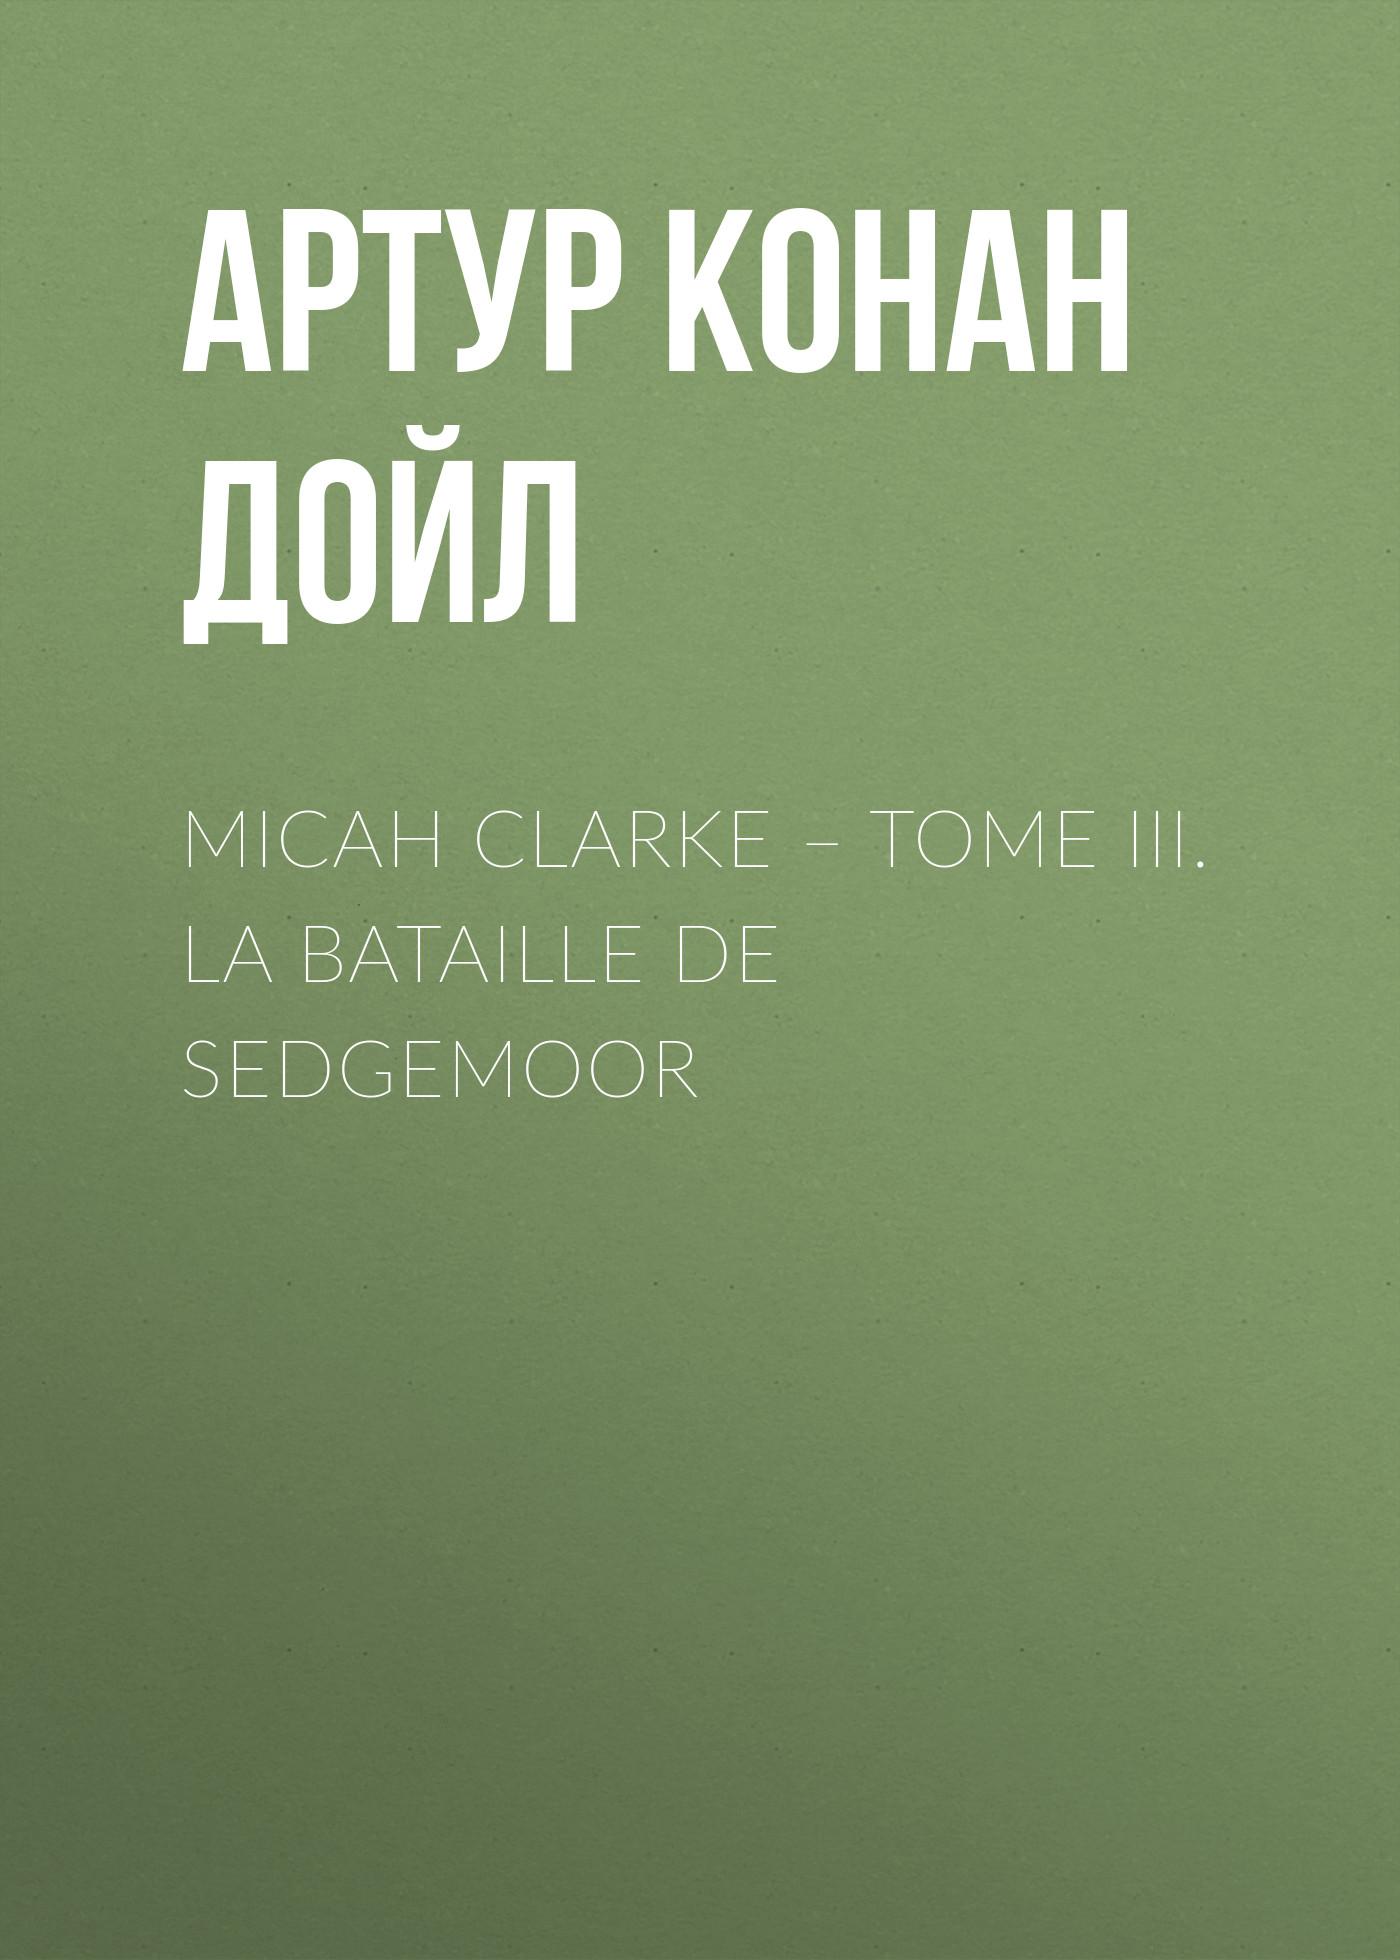 лучшая цена Артур Конан Дойл Micah Clarke – Tome III. La Bataille de Sedgemoor